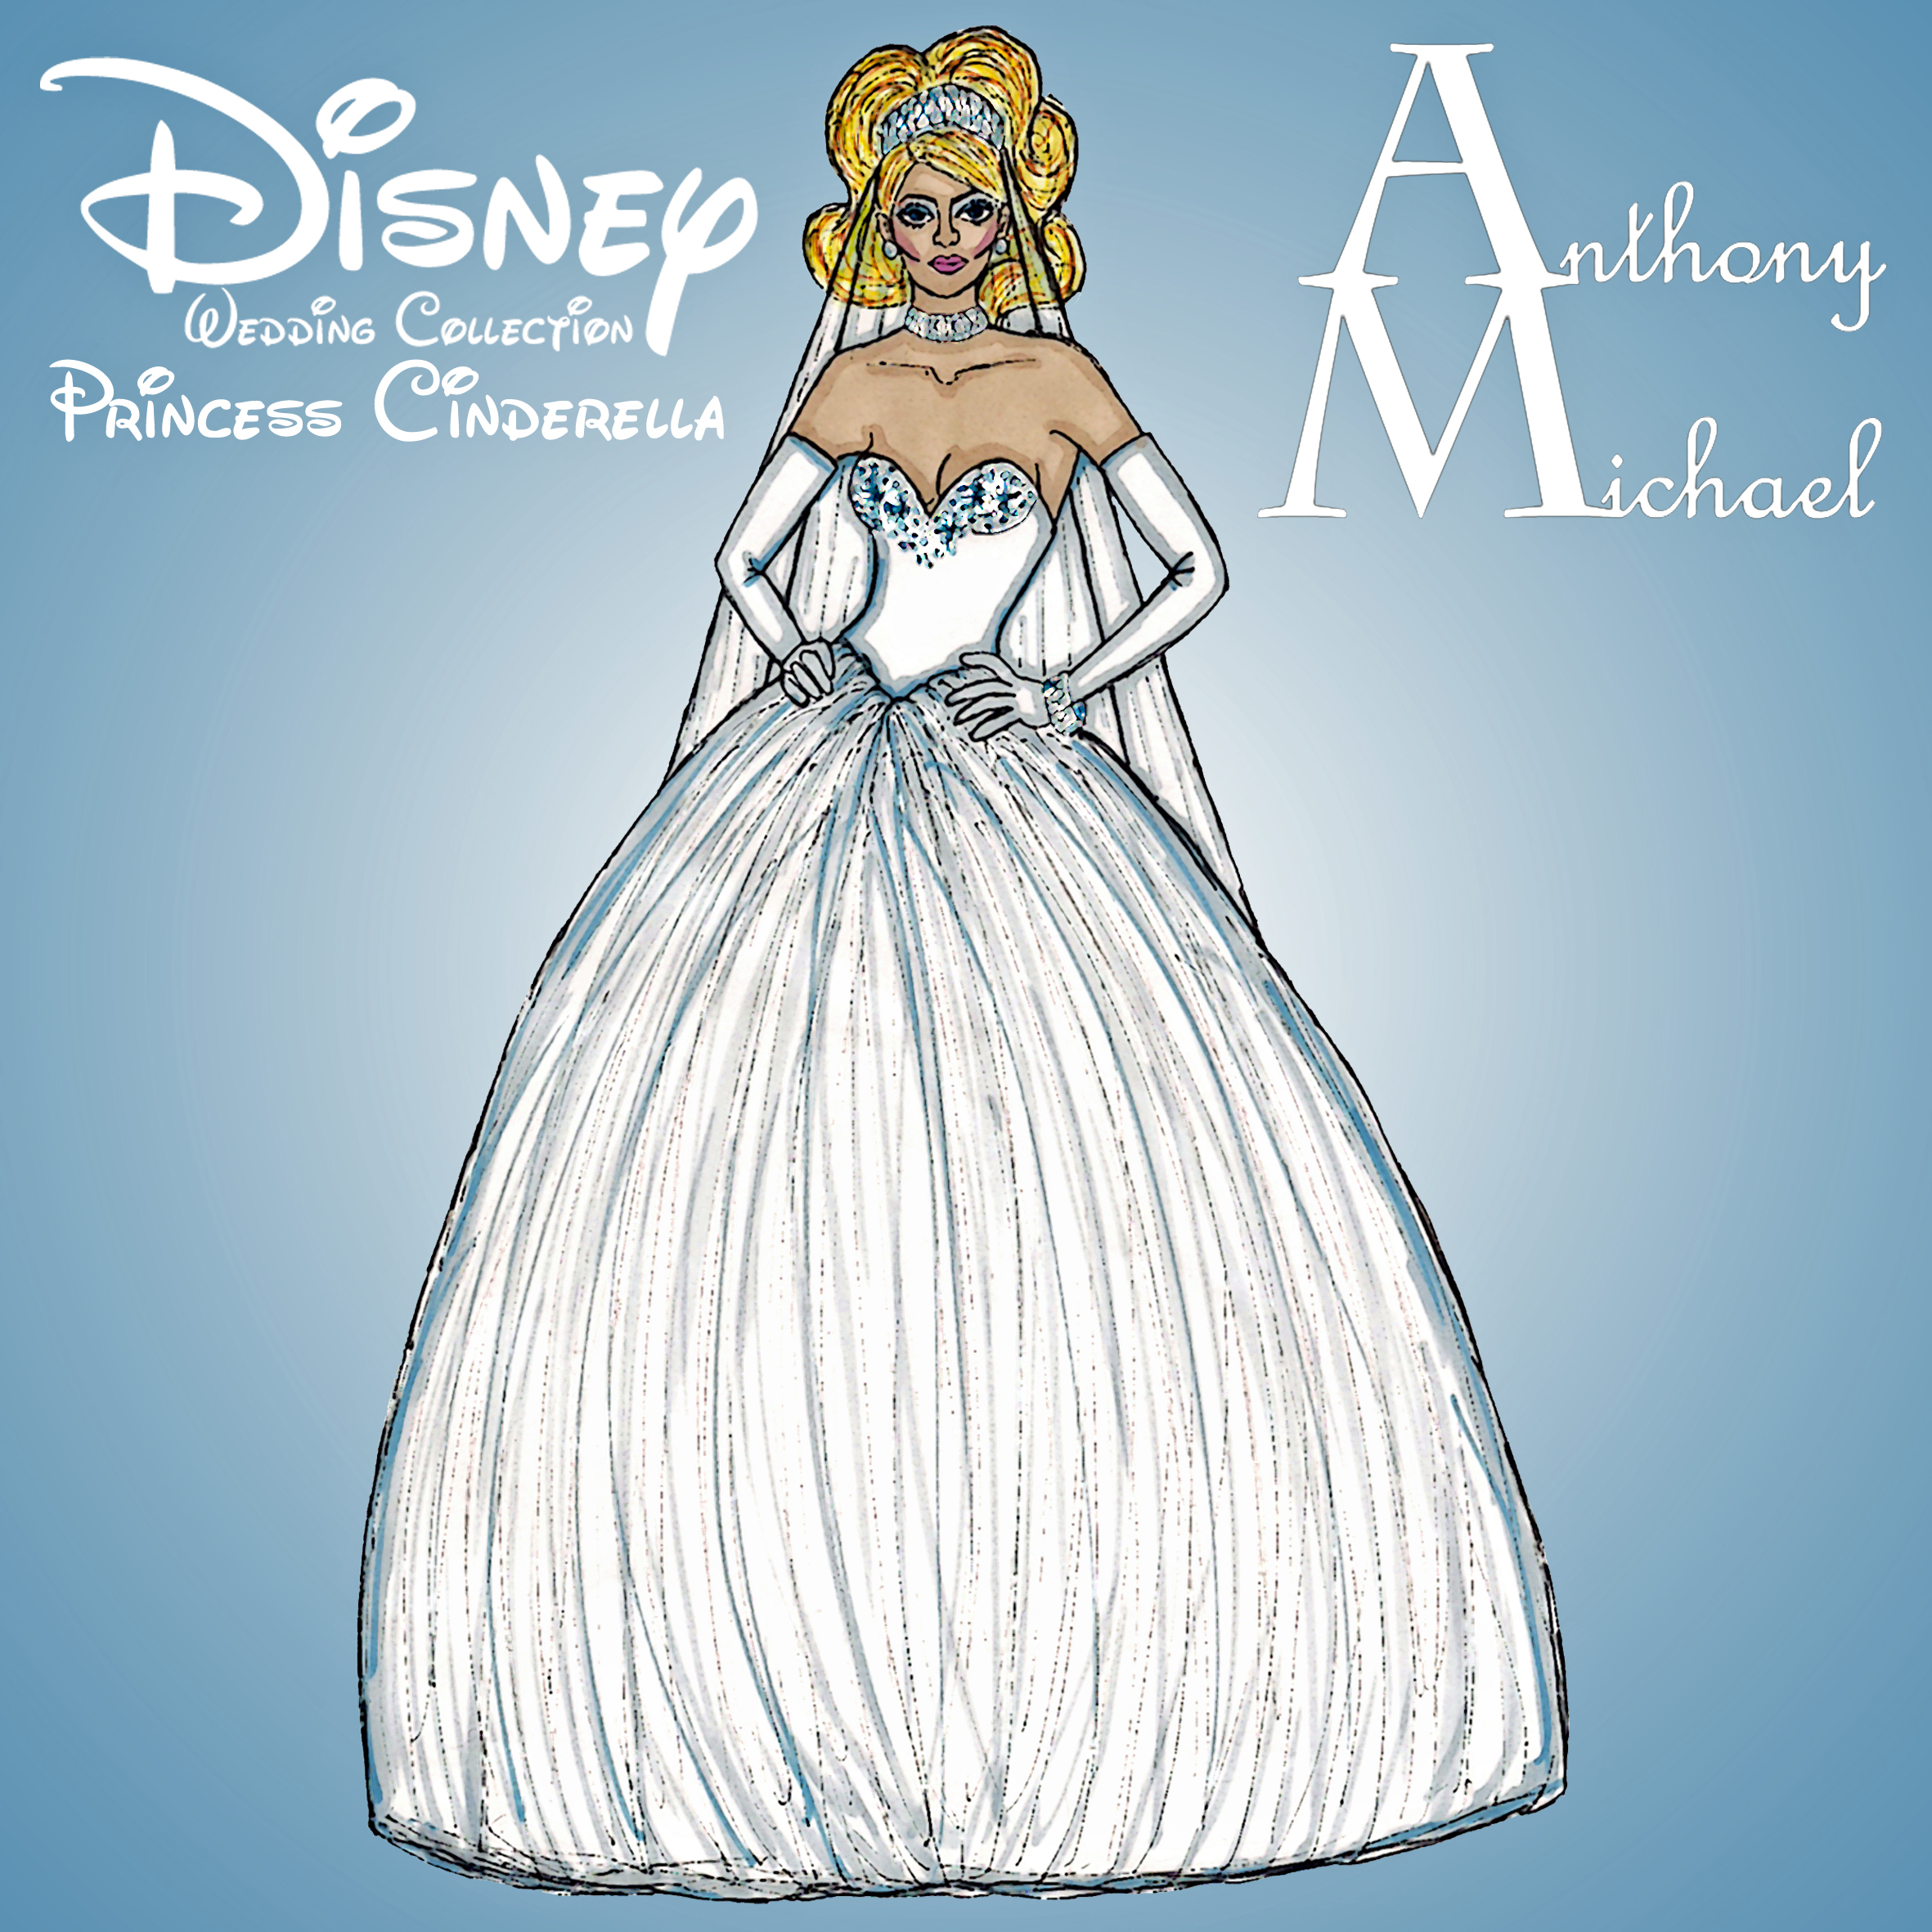 Disney Princess by Anth0nyM1cha3l on DeviantArt